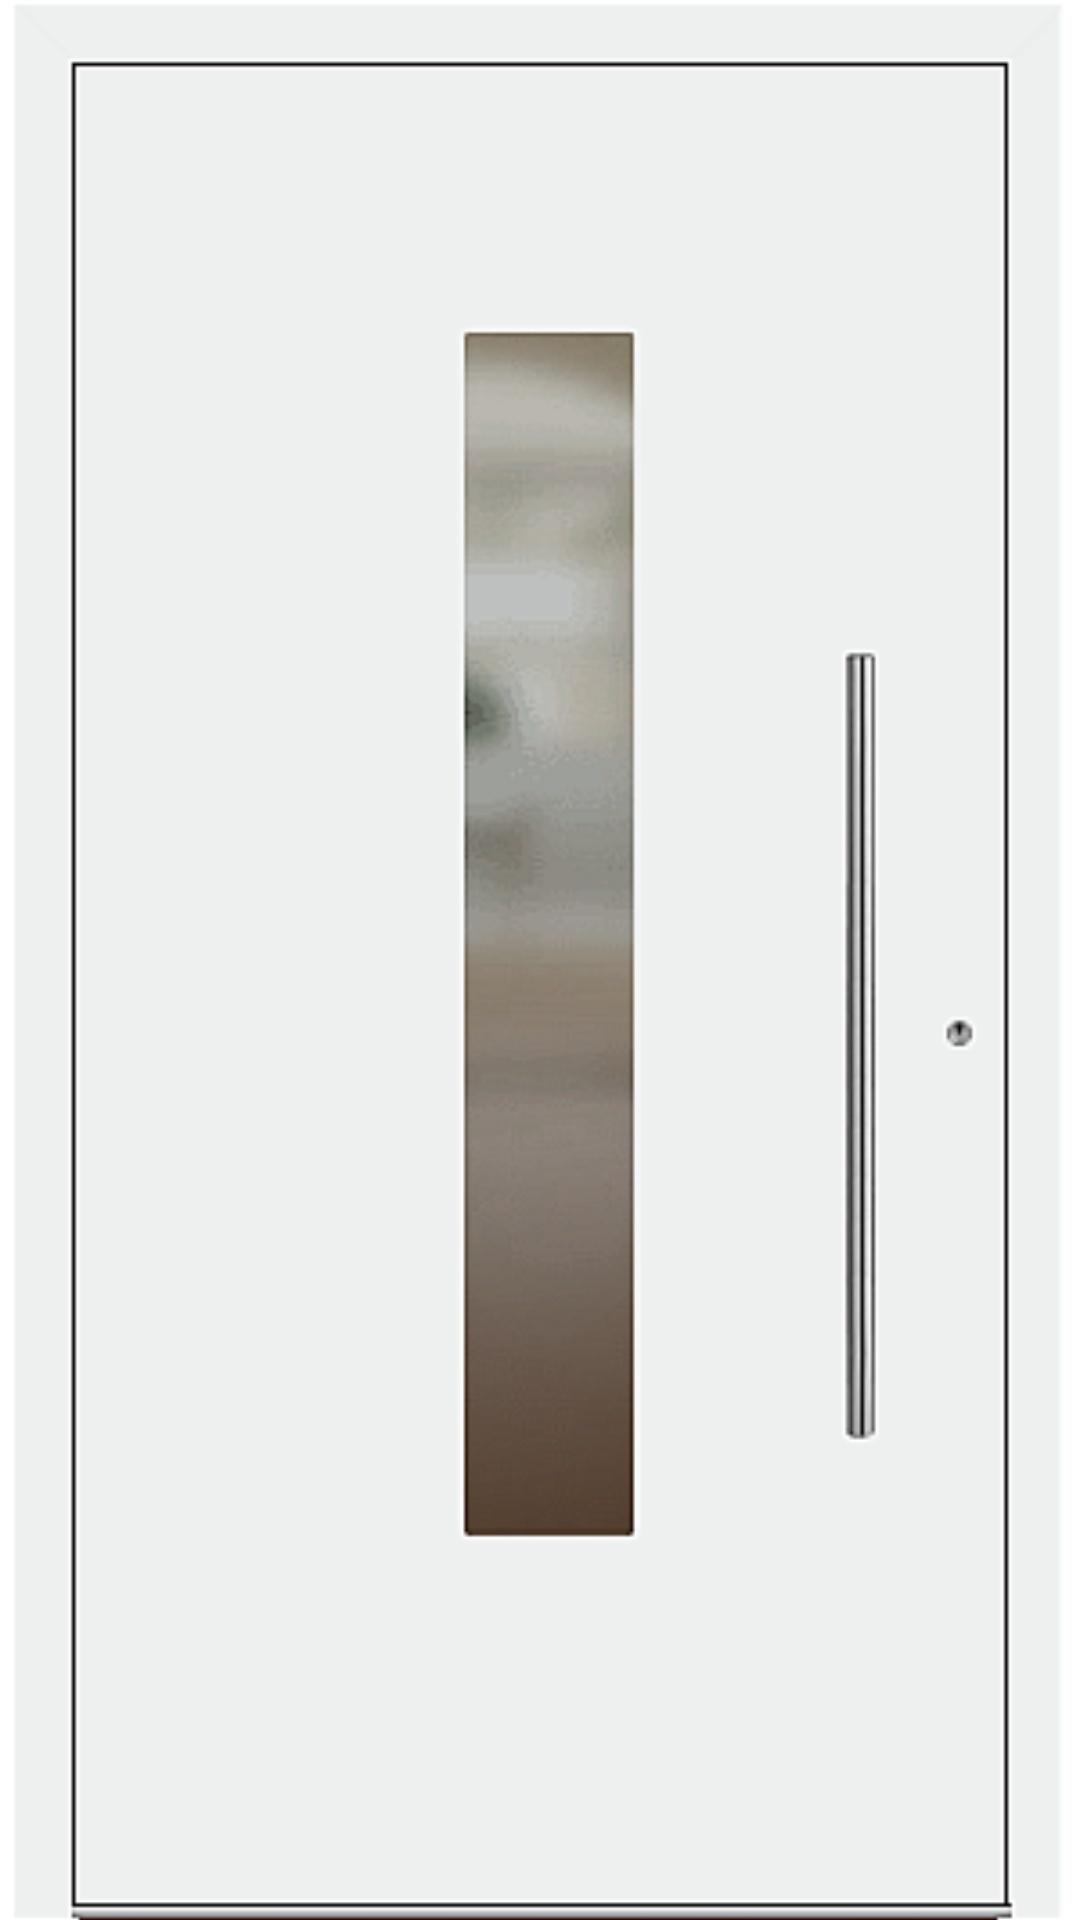 PaXentrée Aluminium Haustür M01210 weiß